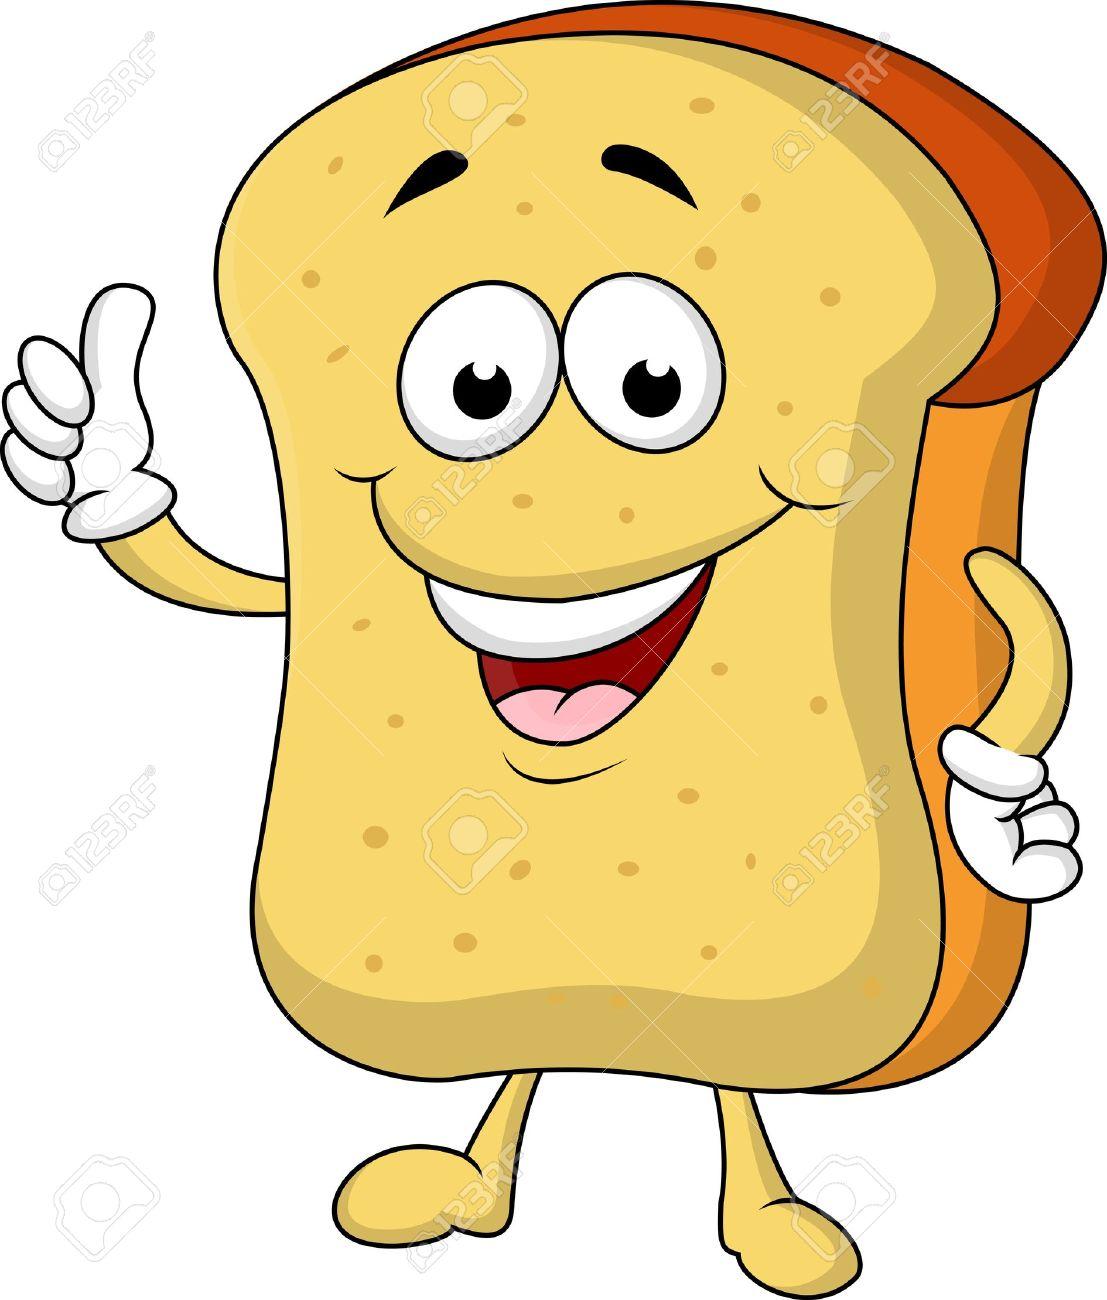 Bread clipart cartoon. Free download best